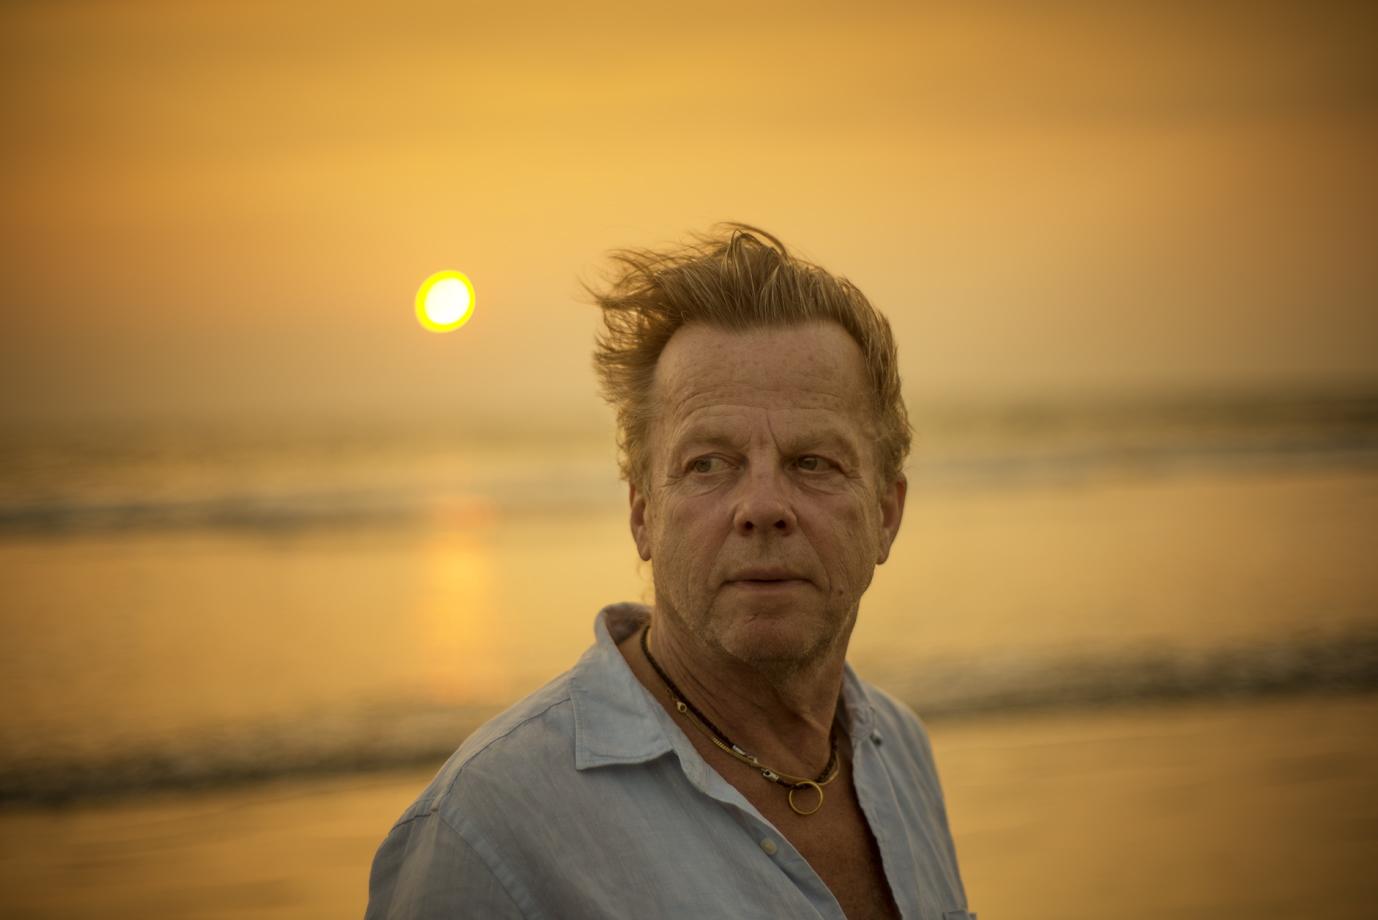 Krister Henriksson, Swedish actor, Goa / India